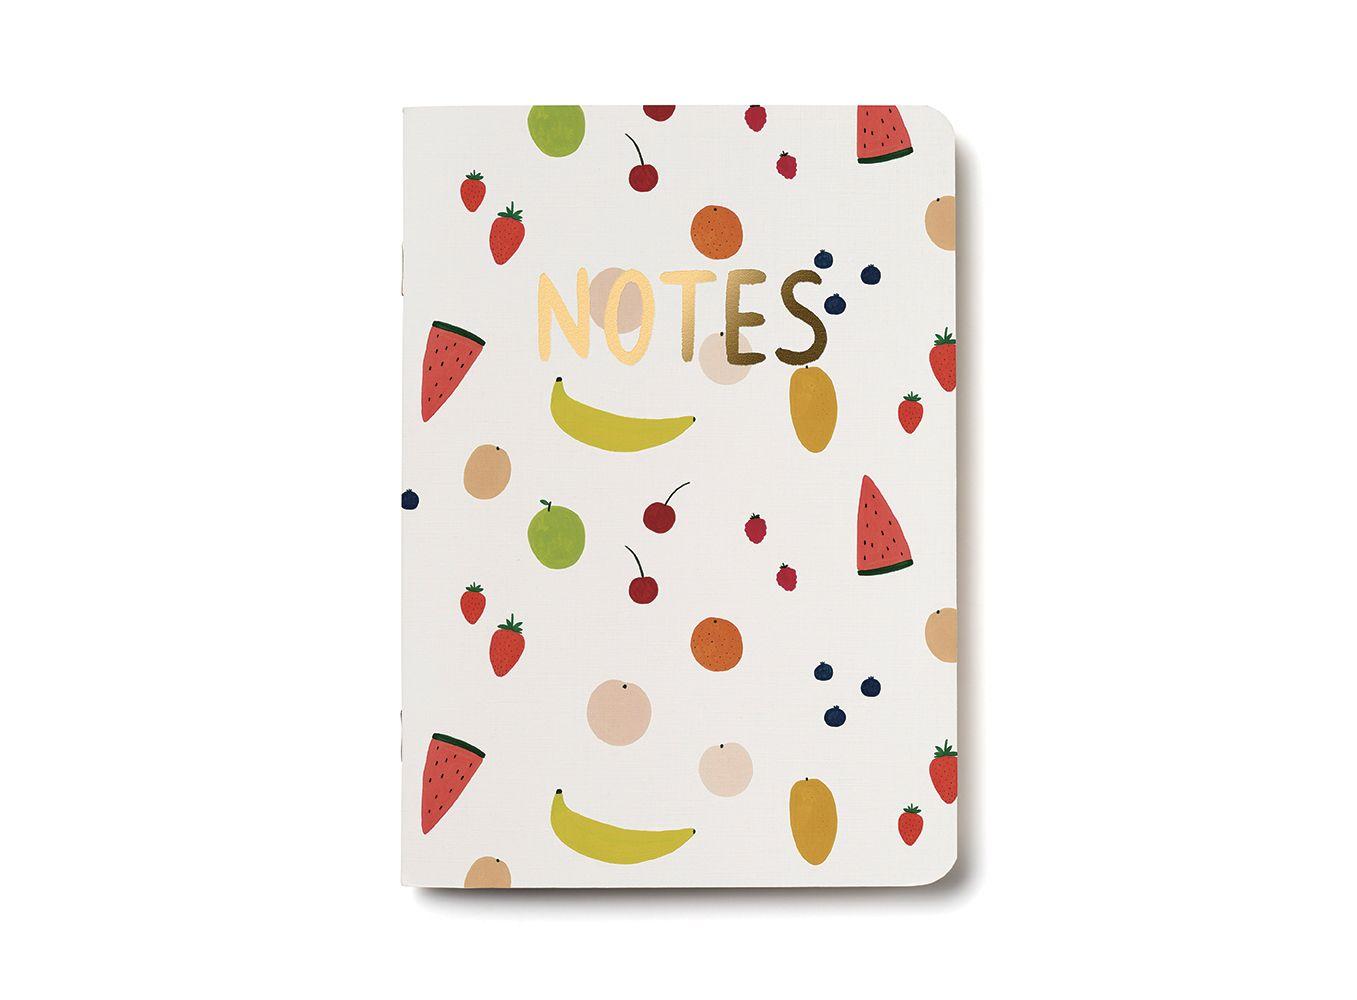 Fruits notebook notebook cards kate pugsley